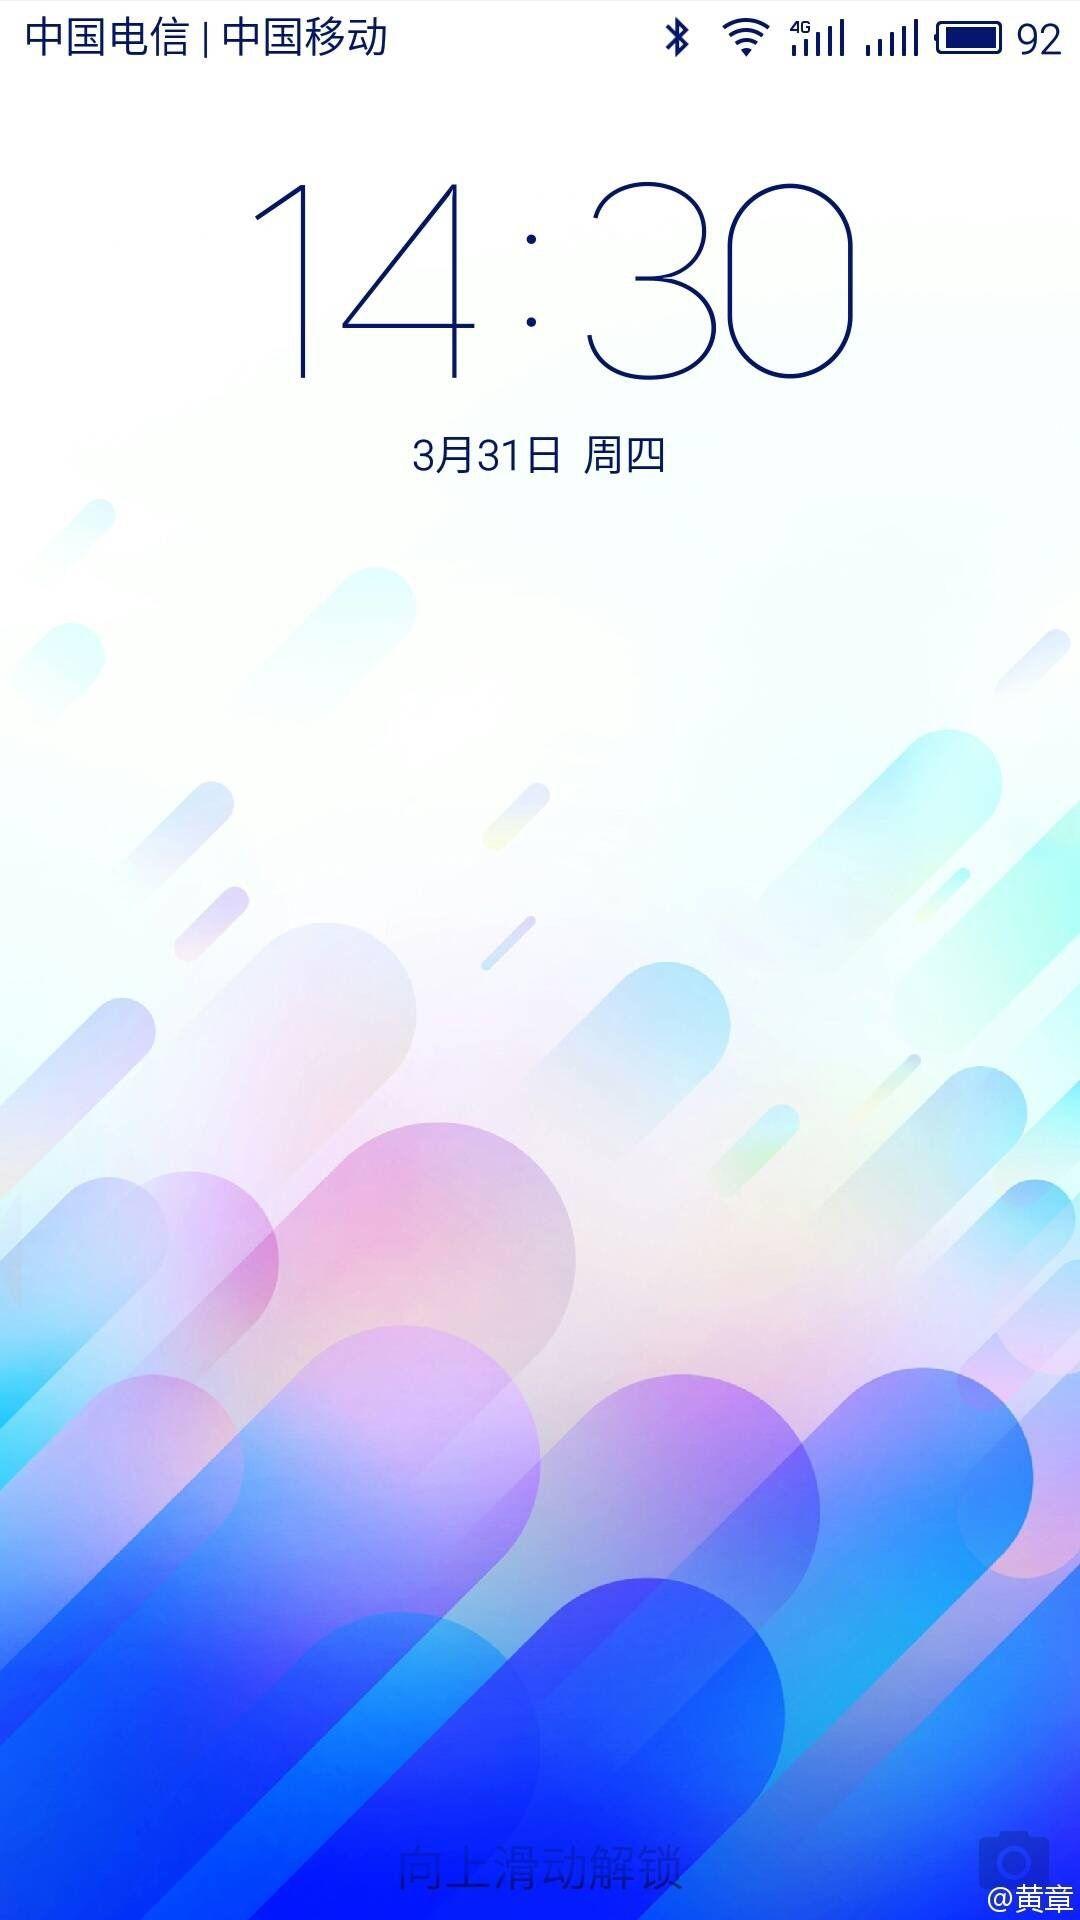 Meizu M3 Noteの中国電信と中国移動のデュアルスタンバイが確認された時の壁紙が配布されました Reameizu